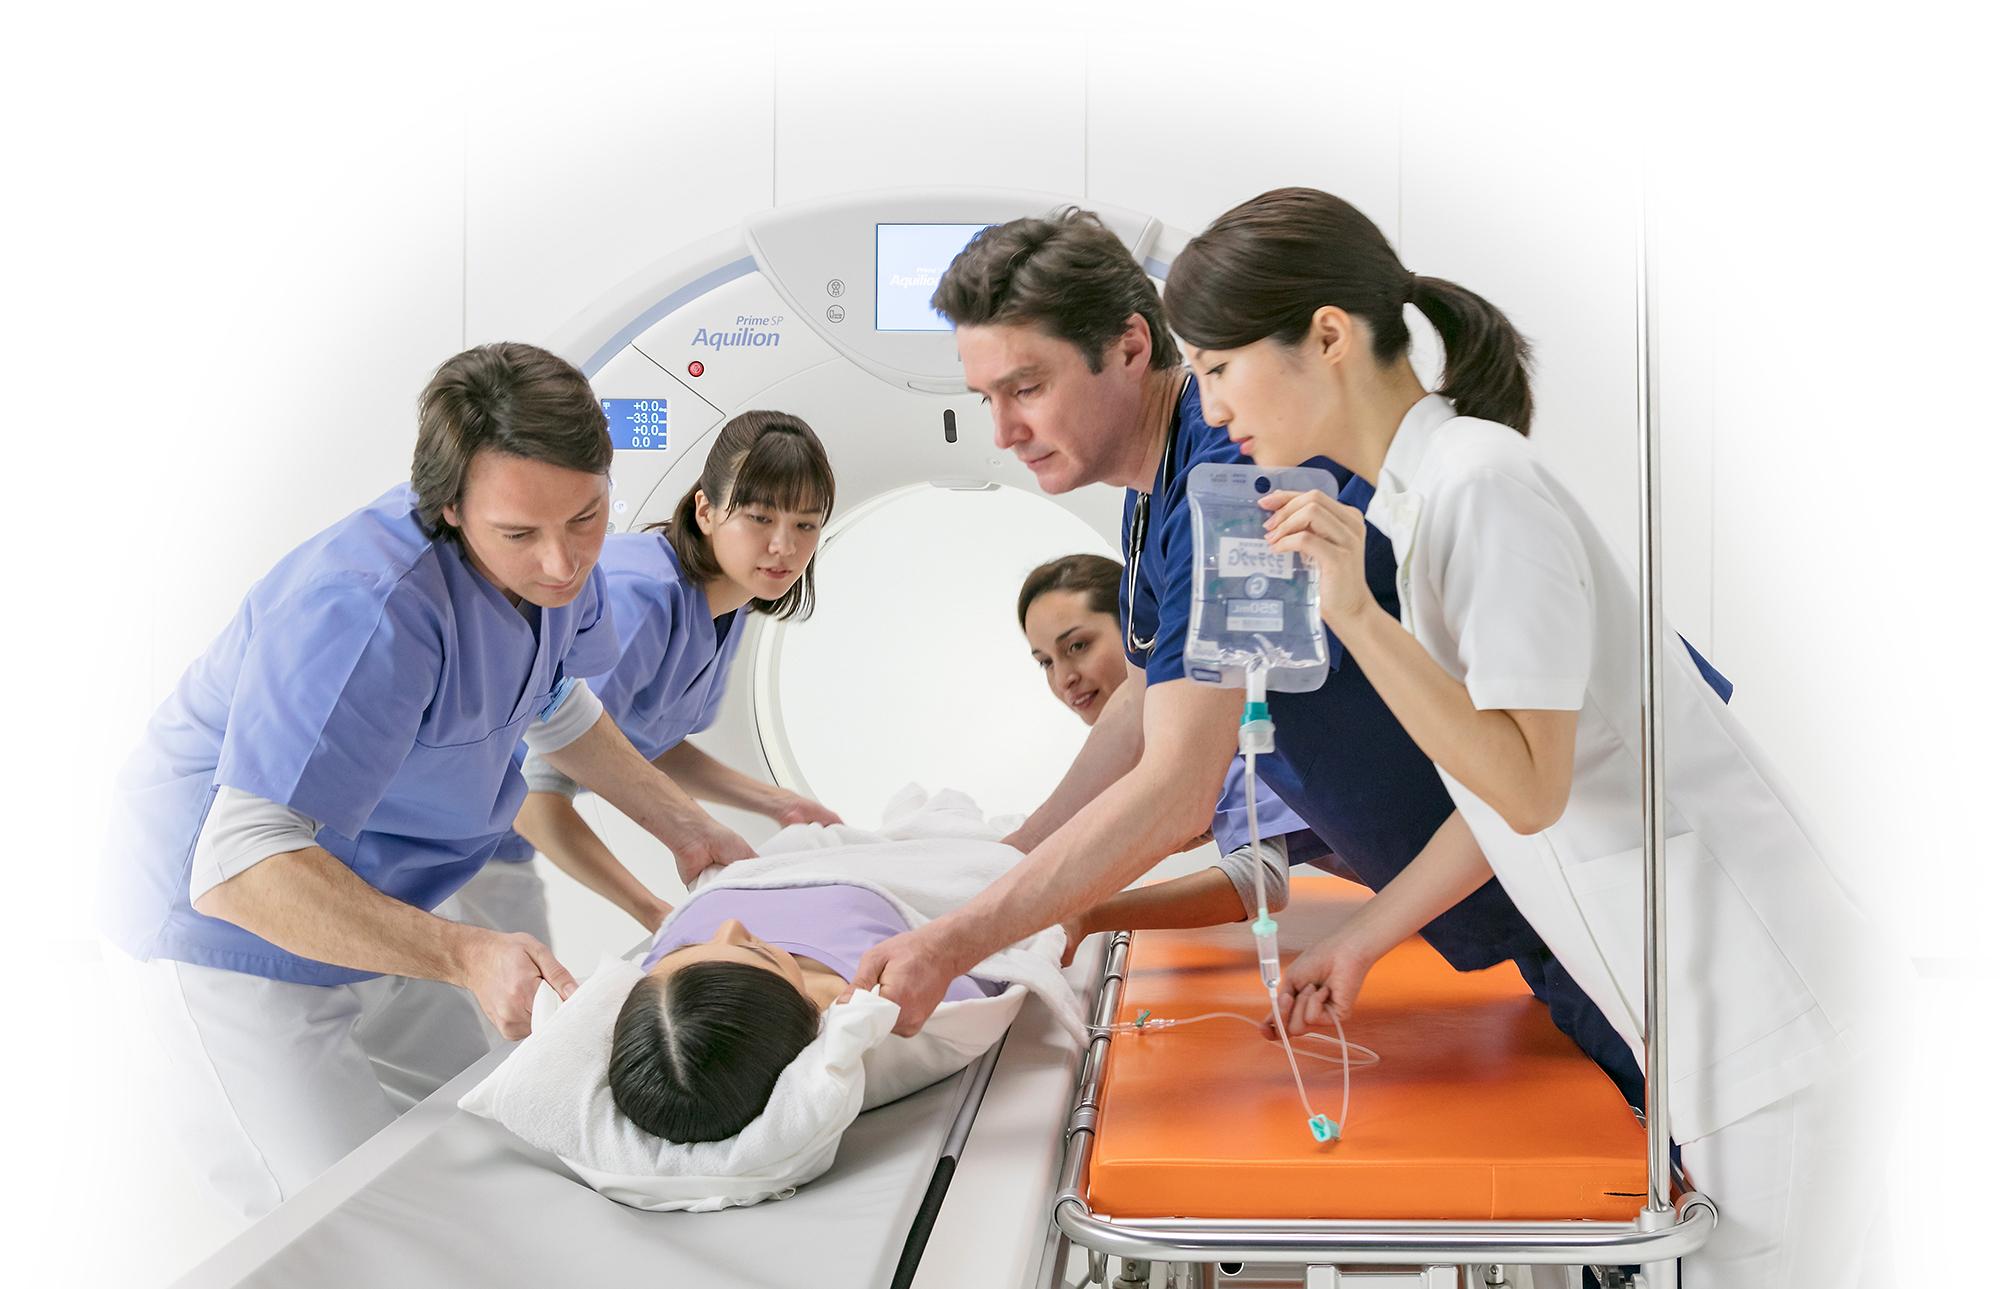 Tech Assist Lateral Slide – Help Technologists Position CT Patients